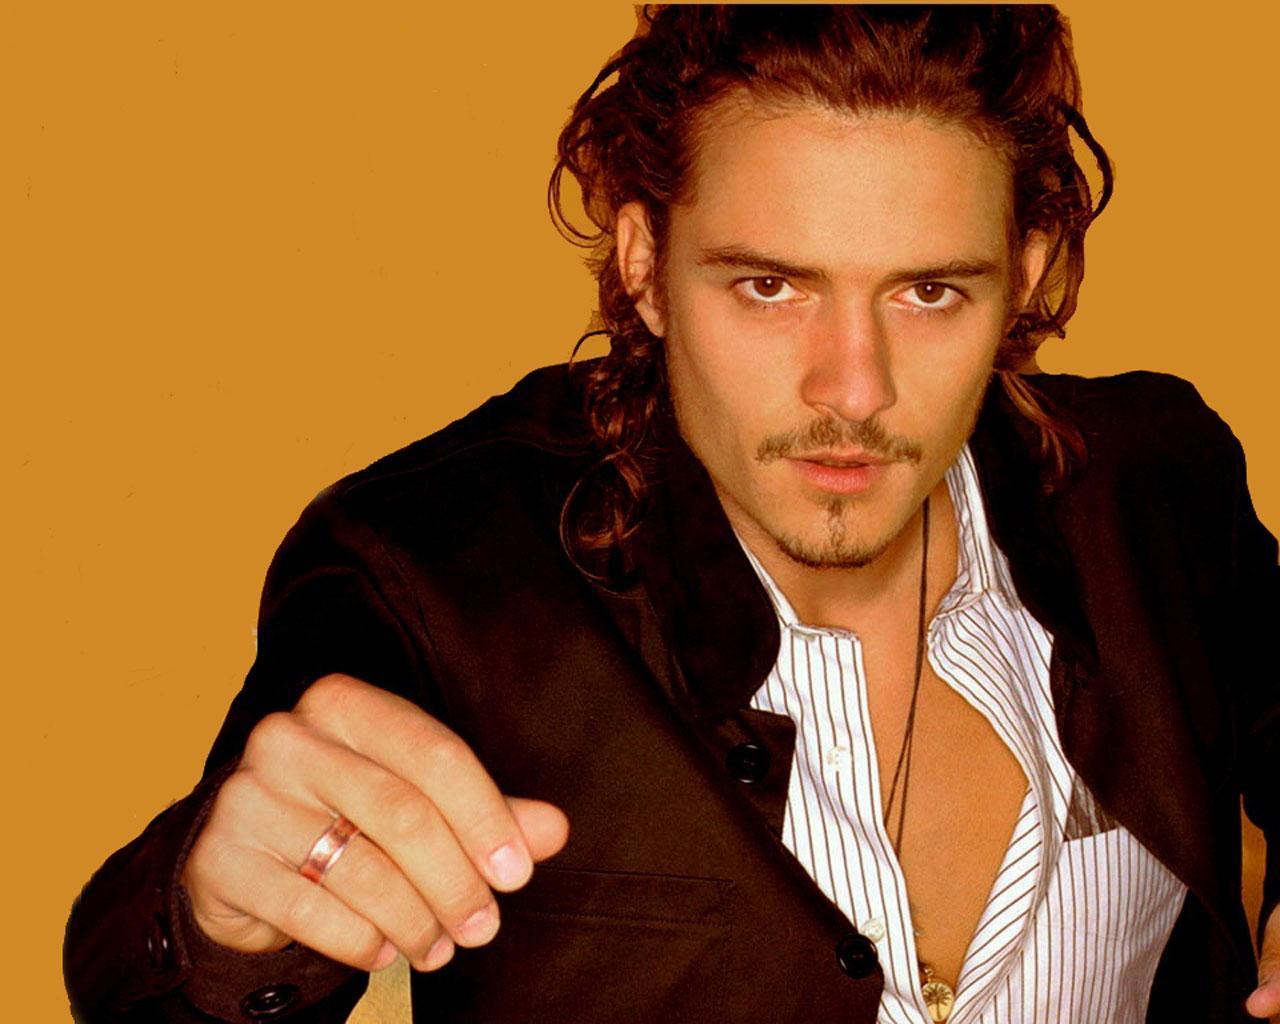 Best looking man - Orlando Bloom 1280x1024 Wallpaper #4